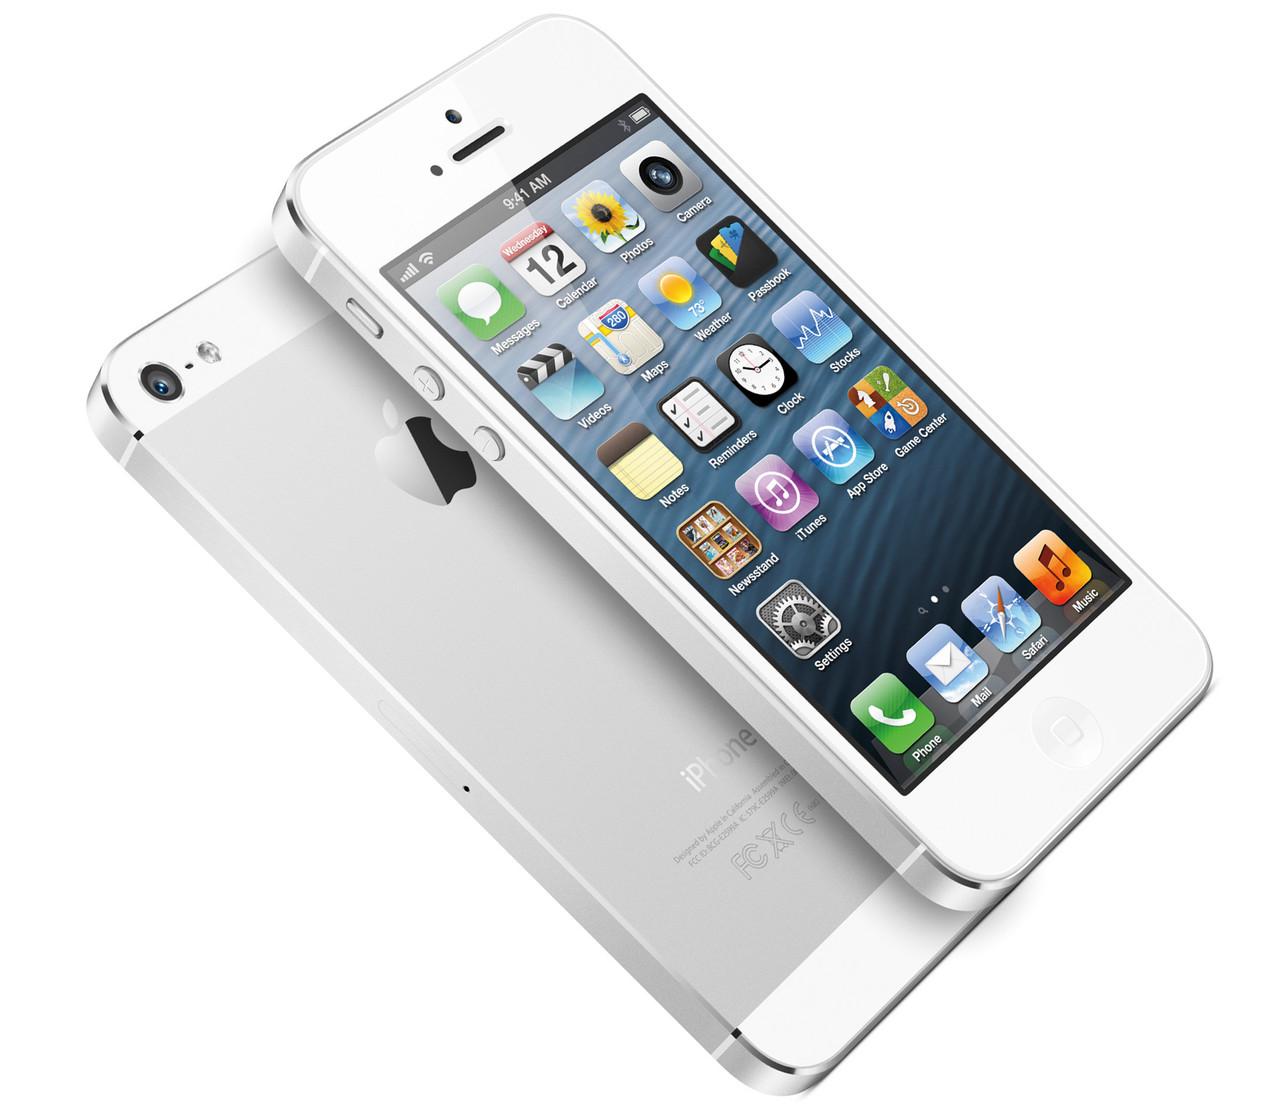 Apple iPhone 5 64GB (White) Refurbished